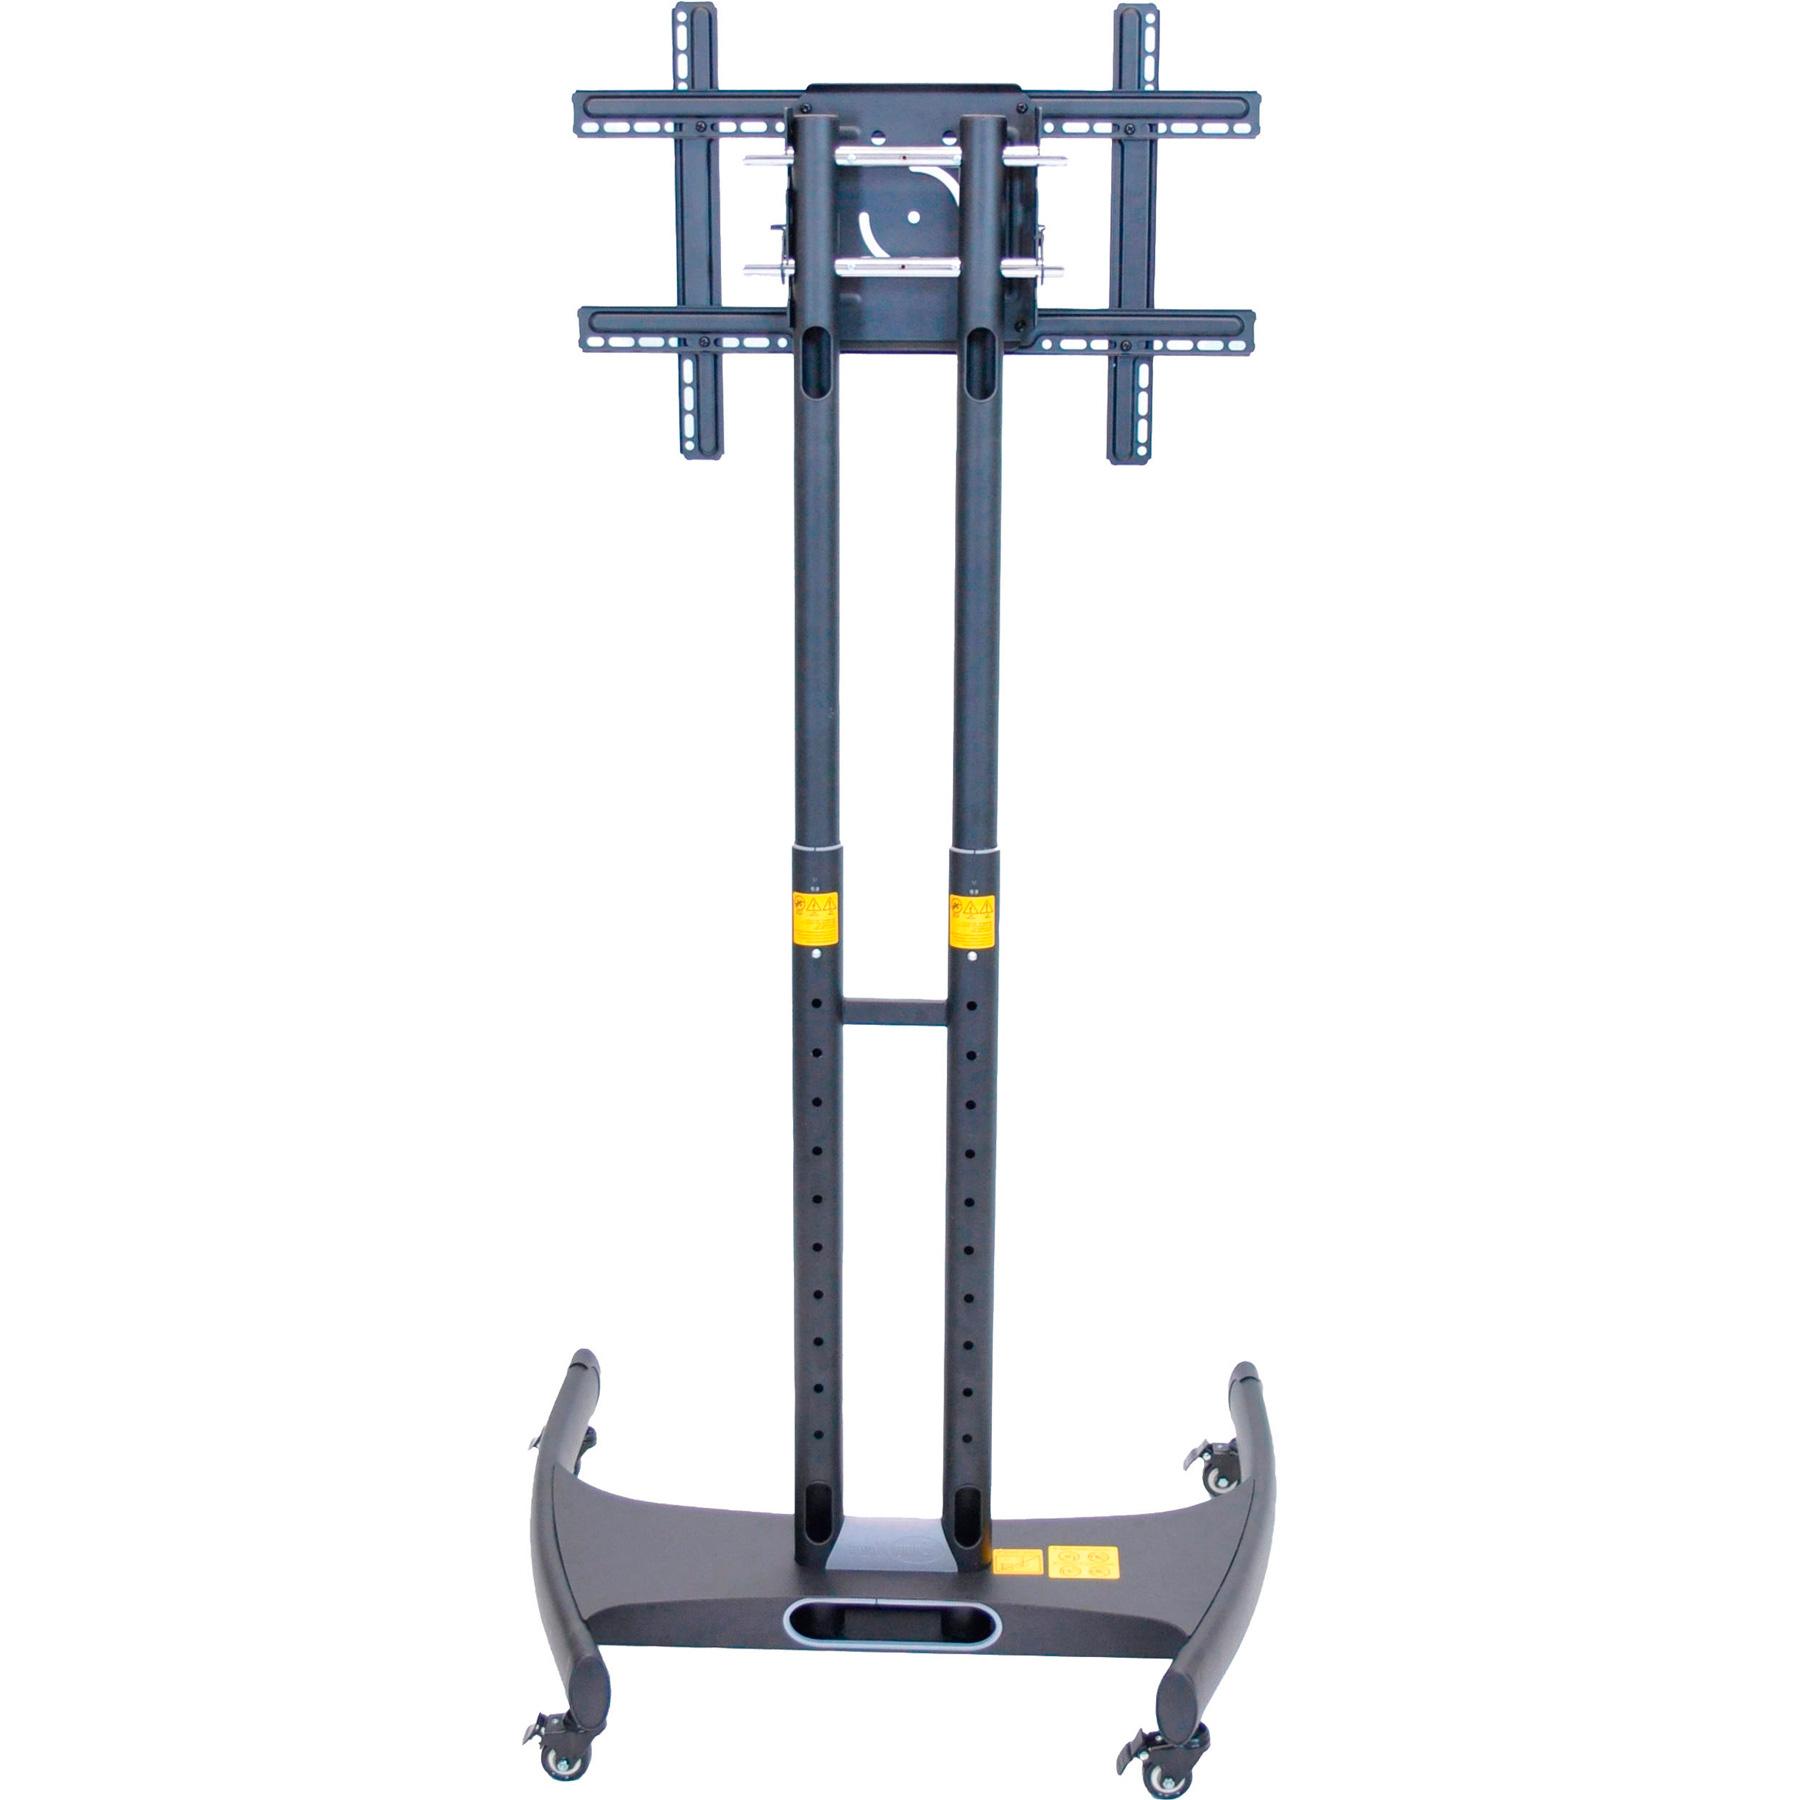 Luxor Fp2000 Adjustable Height Tv Stand Regarding Mount Factory Rolling Tv Stands (View 18 of 20)